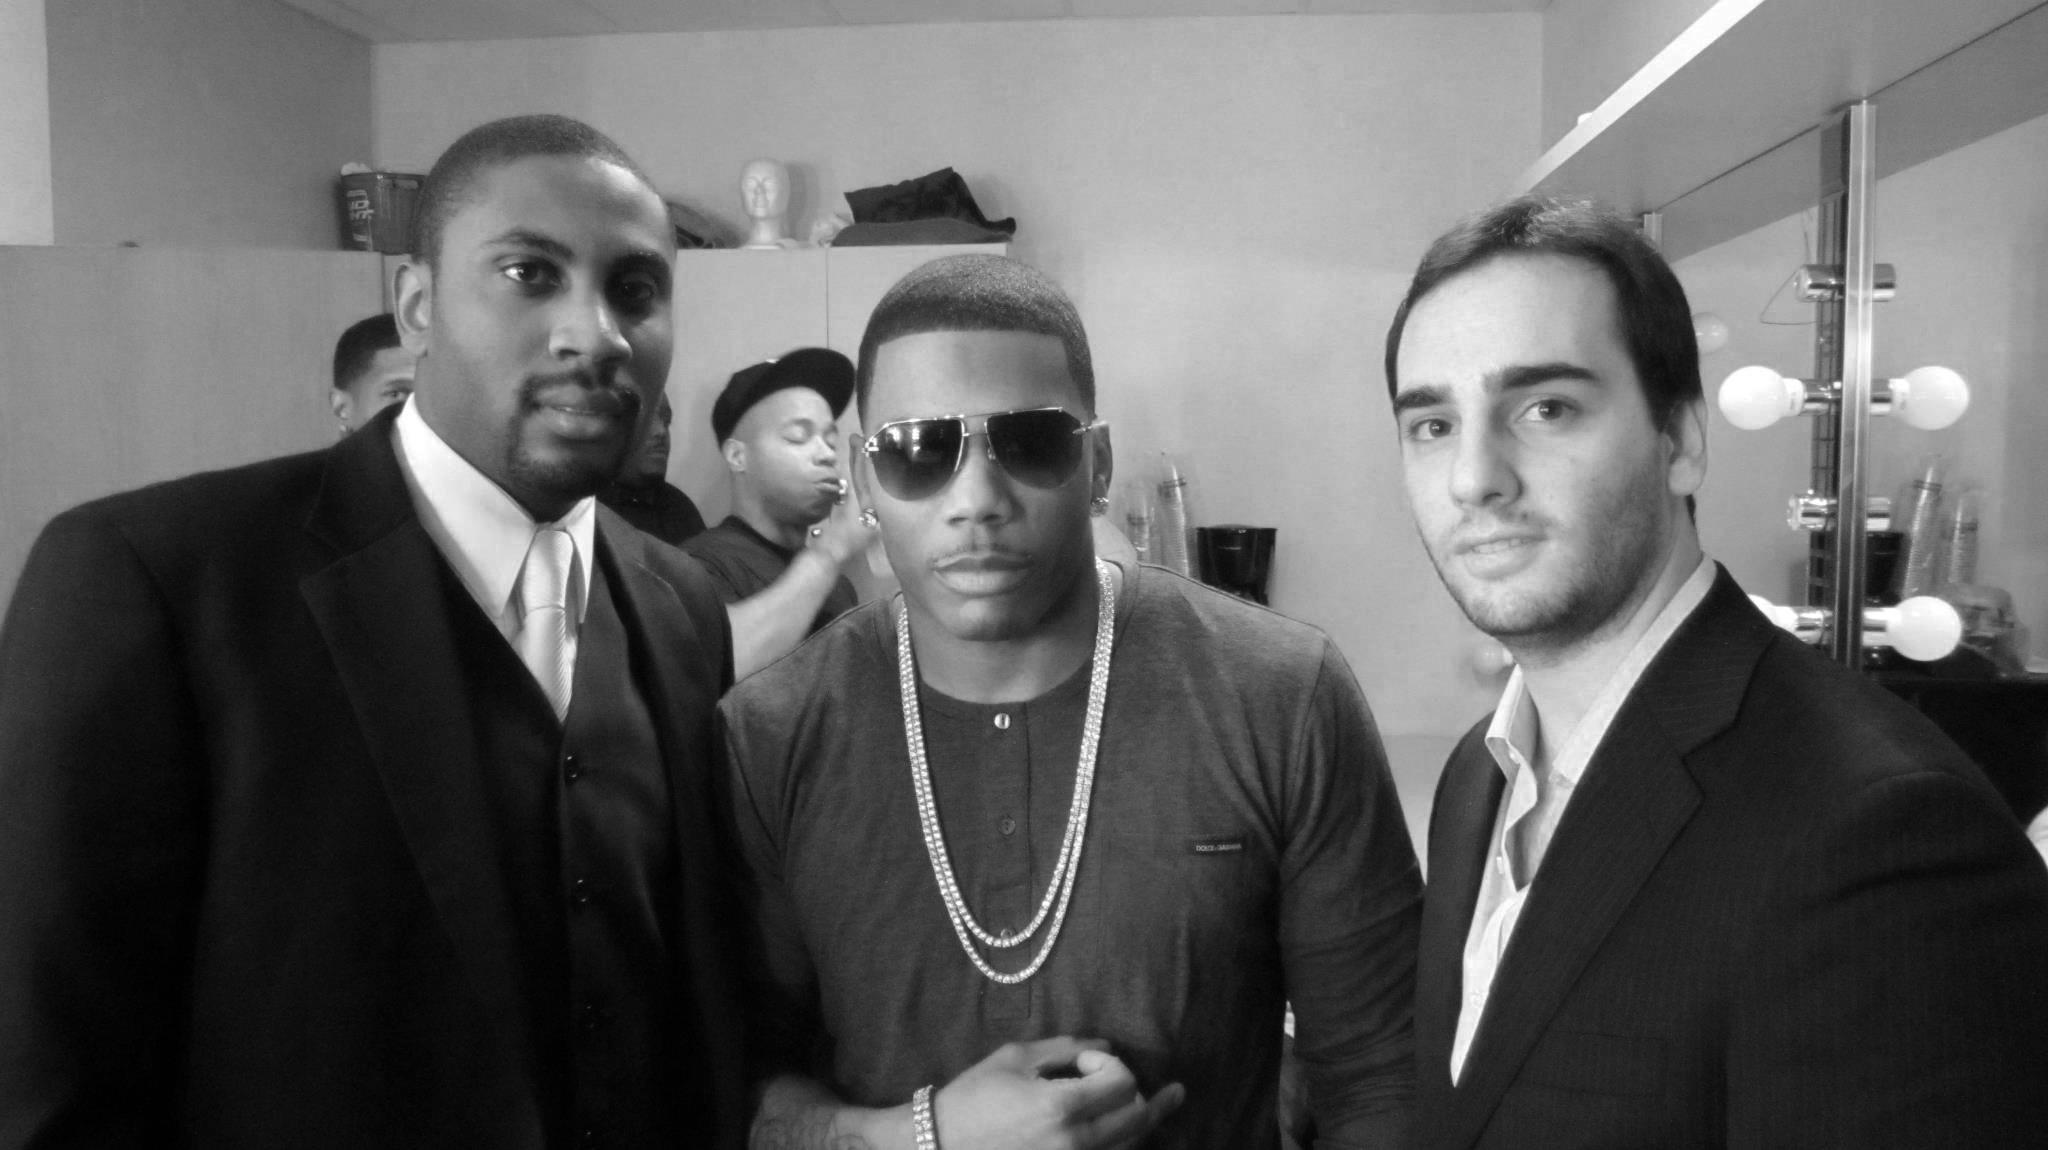 Jonathan Emile / Nelly / NT - Las Vegas 2012